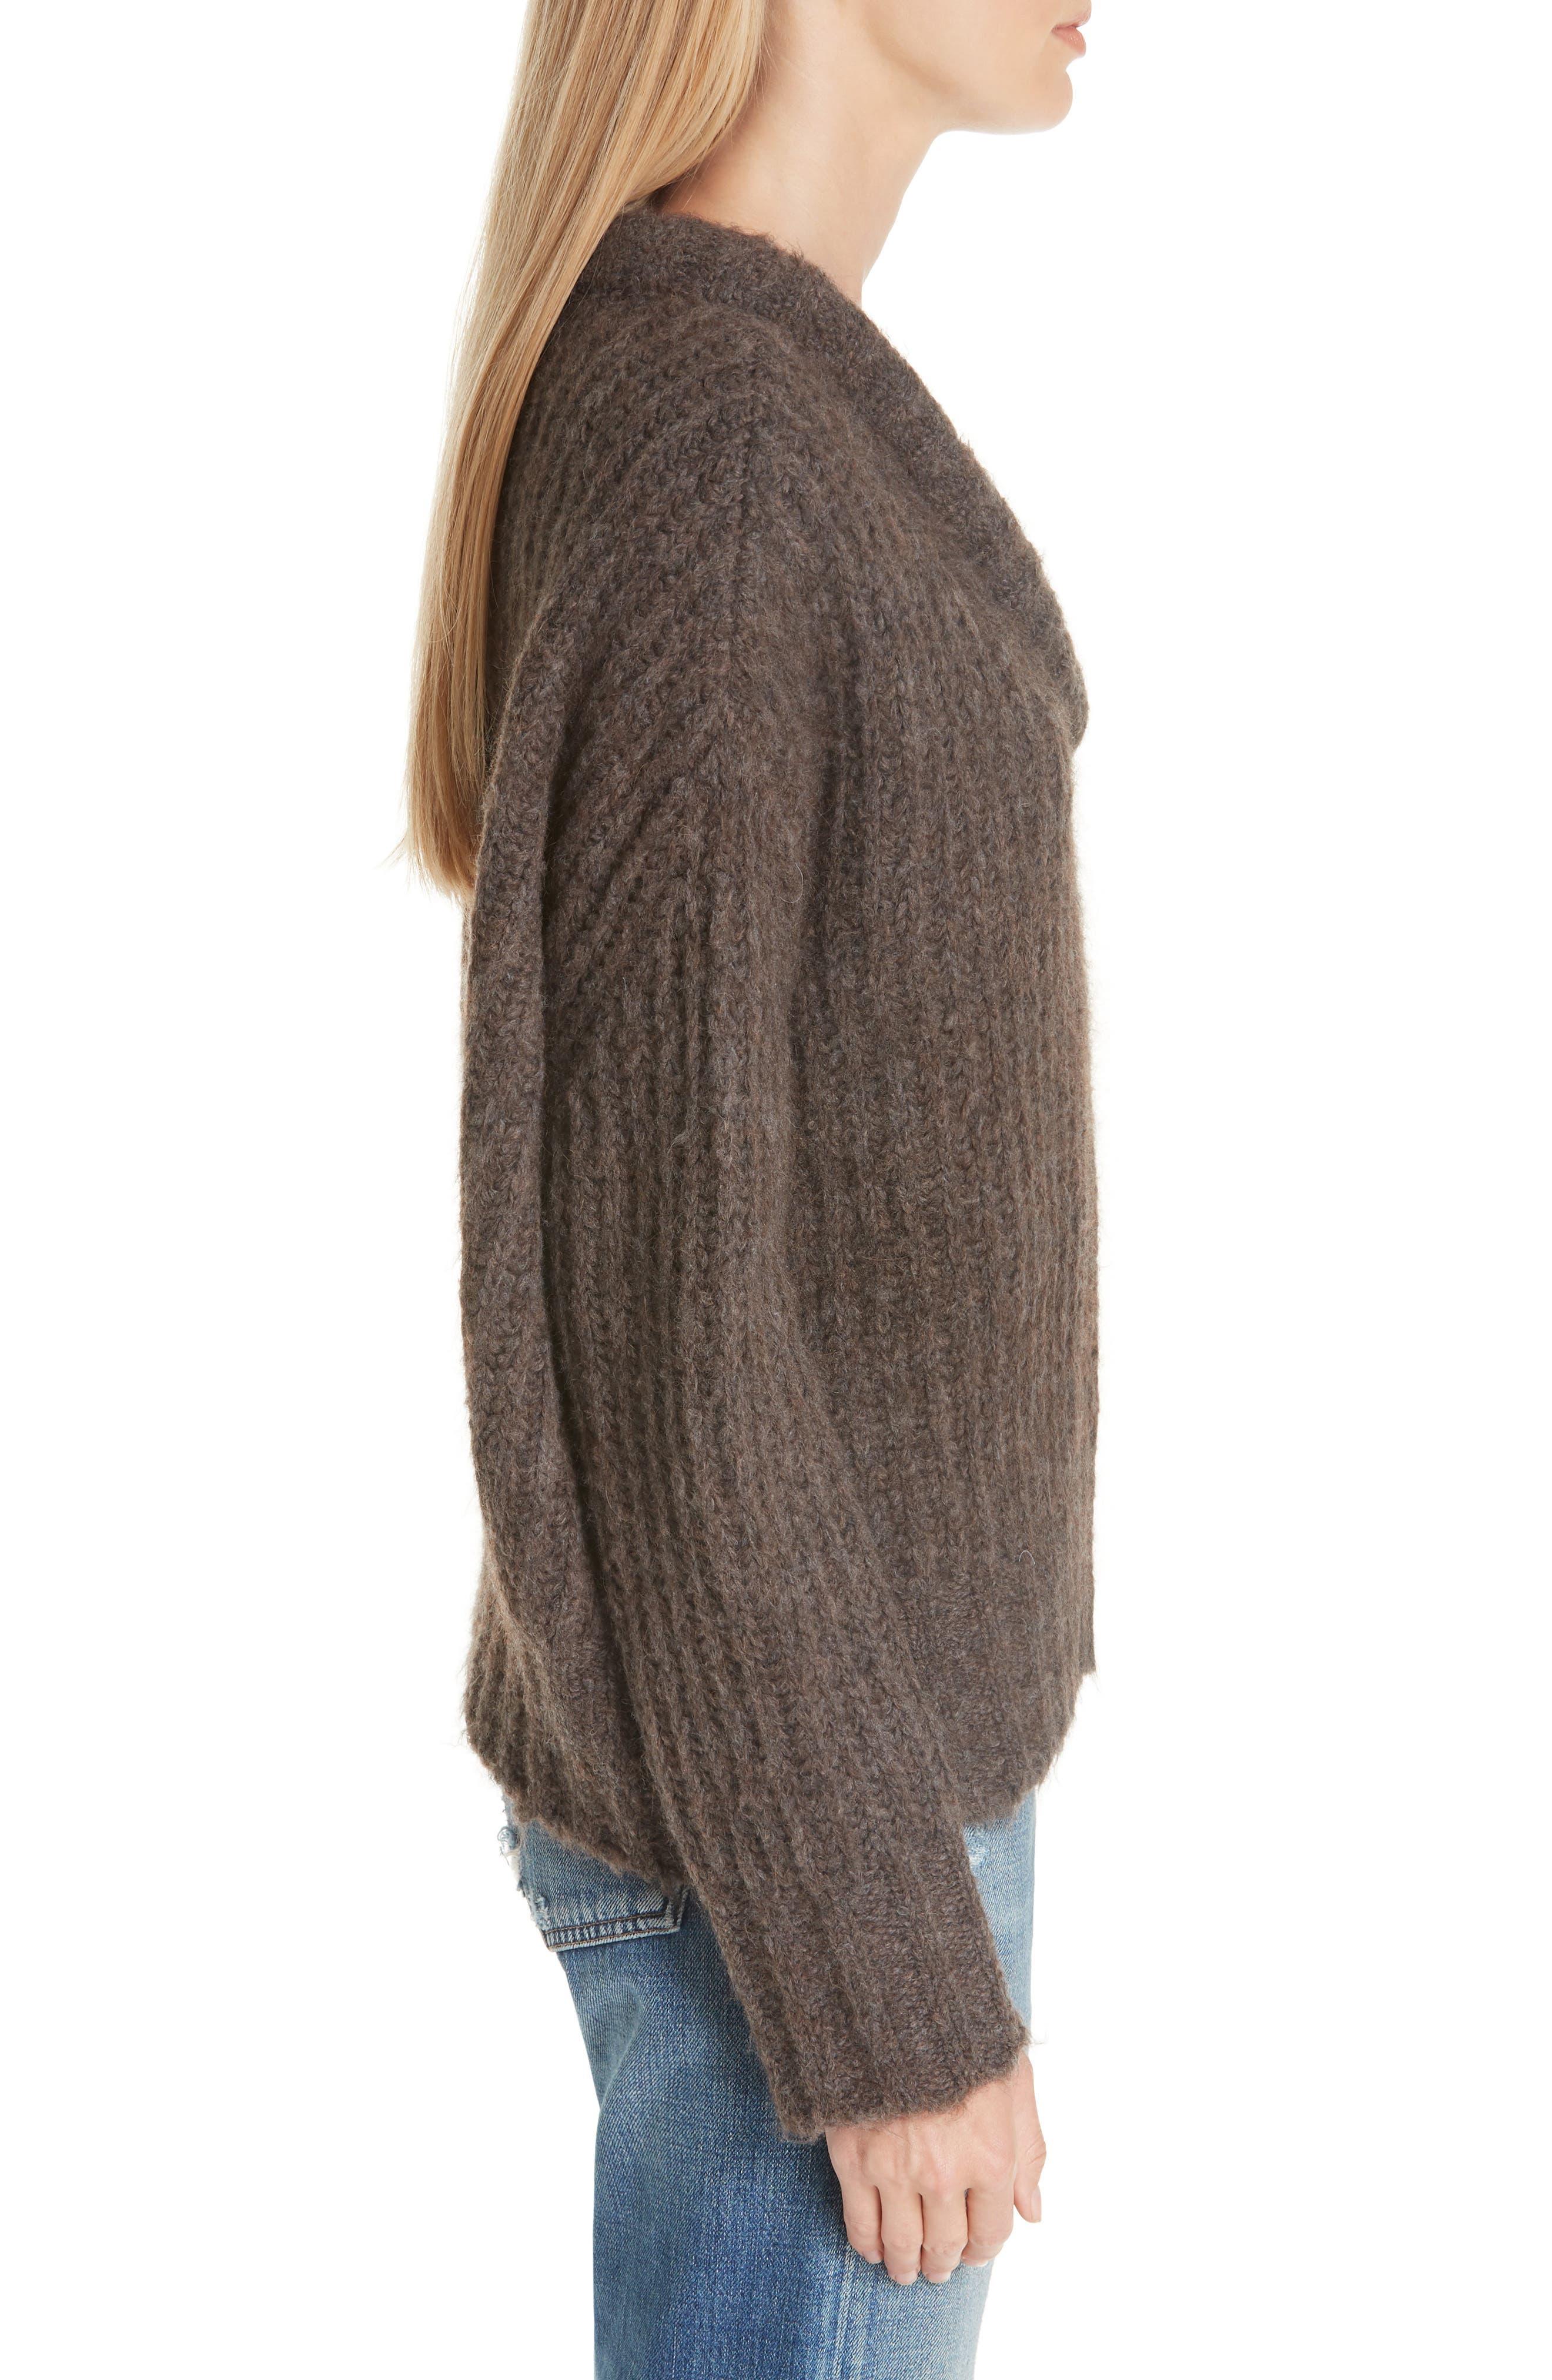 Fabiana Boxy Sweater,                             Alternate thumbnail 3, color,                             230